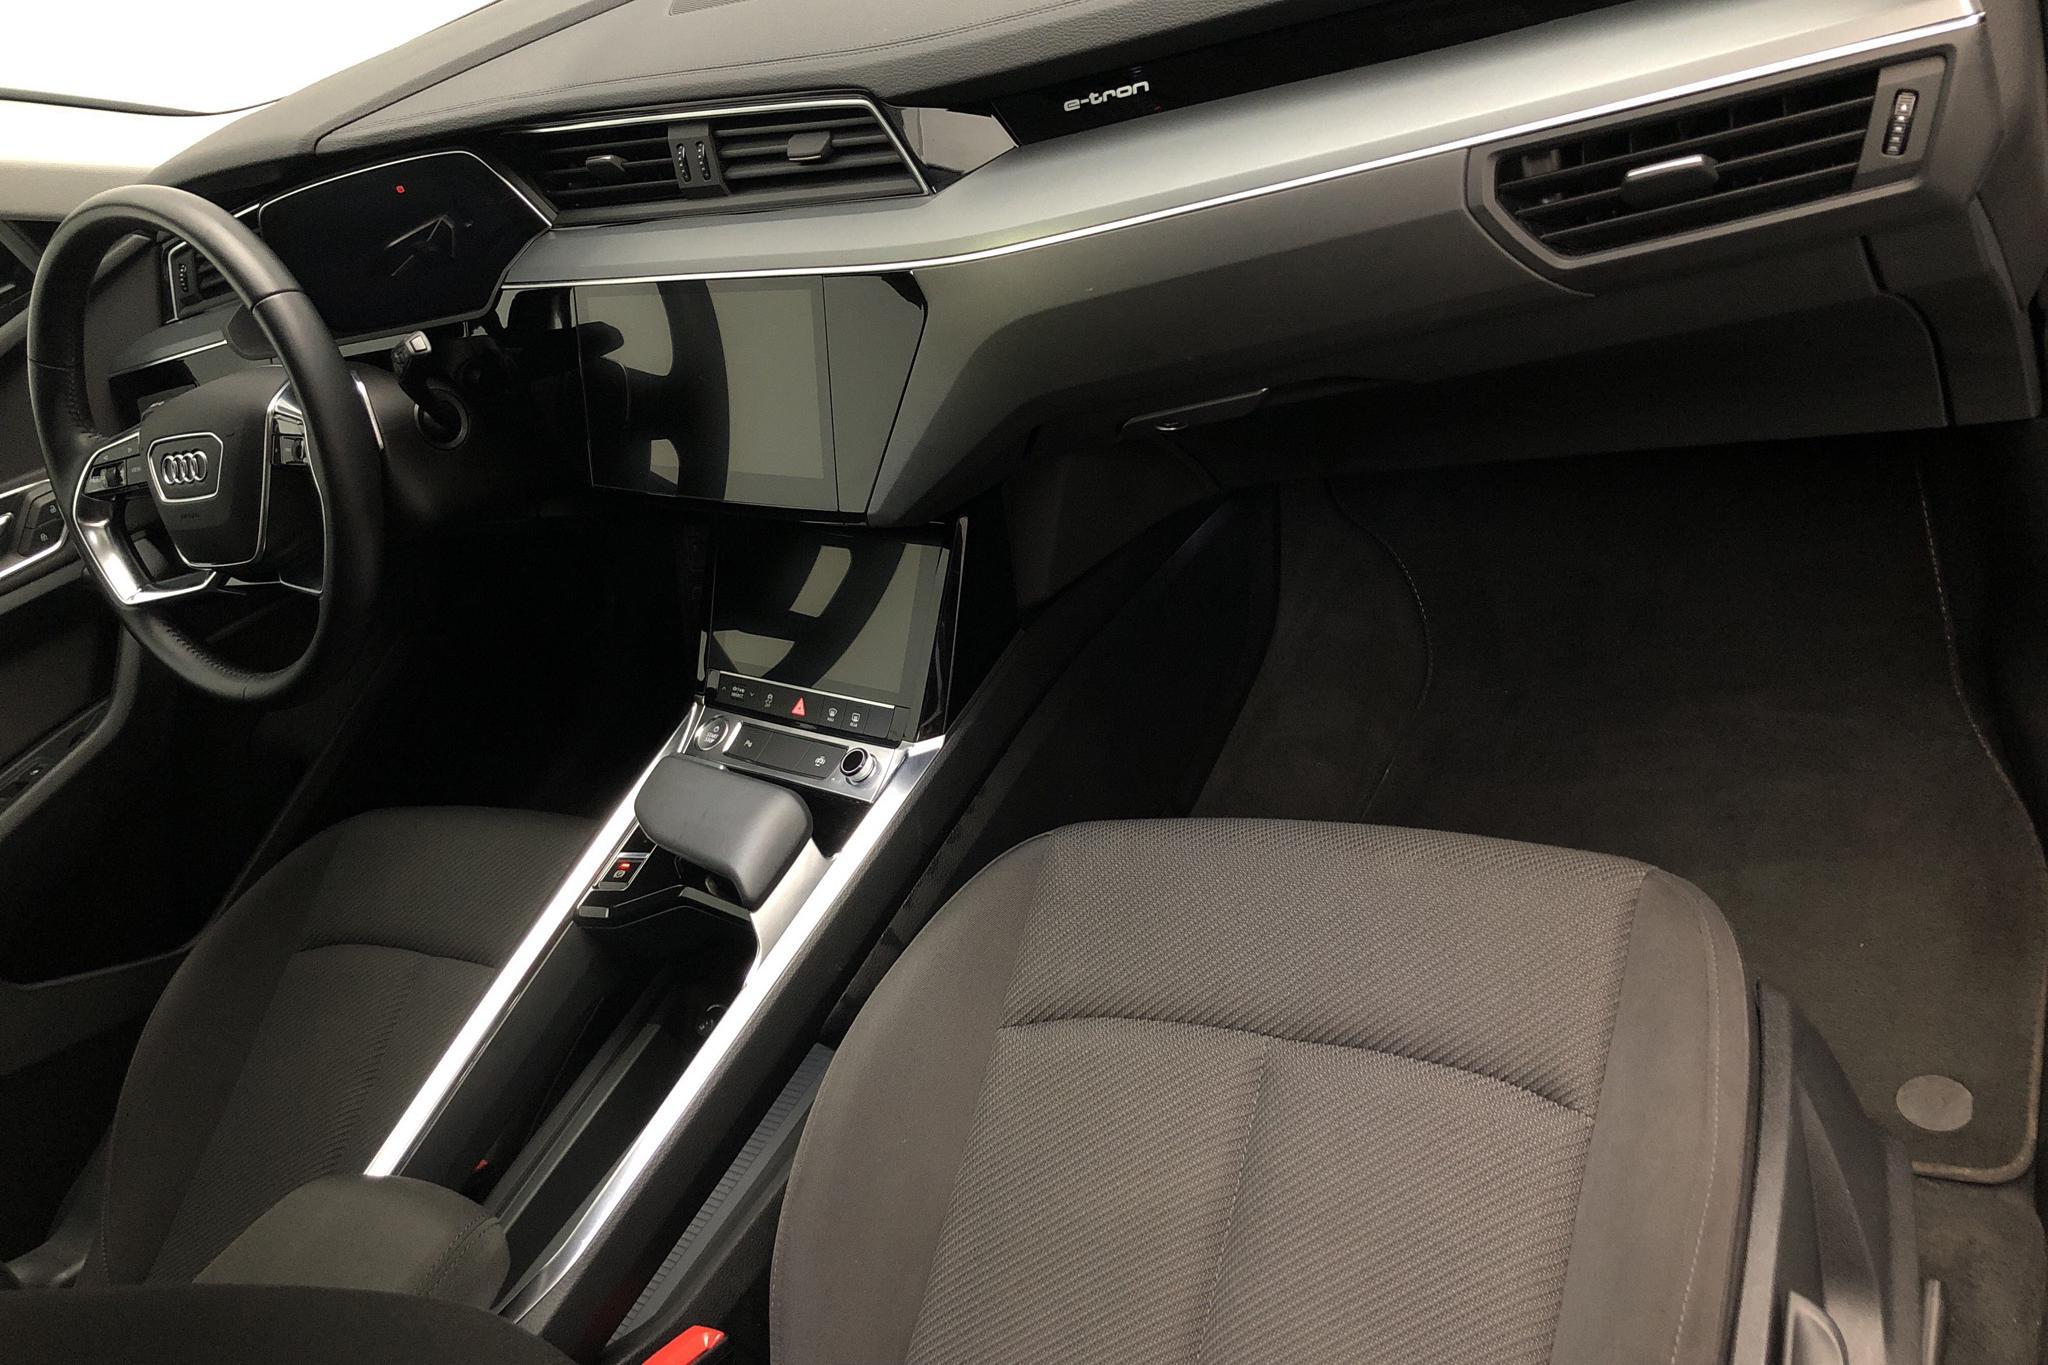 Audi e-tron 50 quattro 71 kWh (288hk) - 23 030 km - Automatic - black - 2020